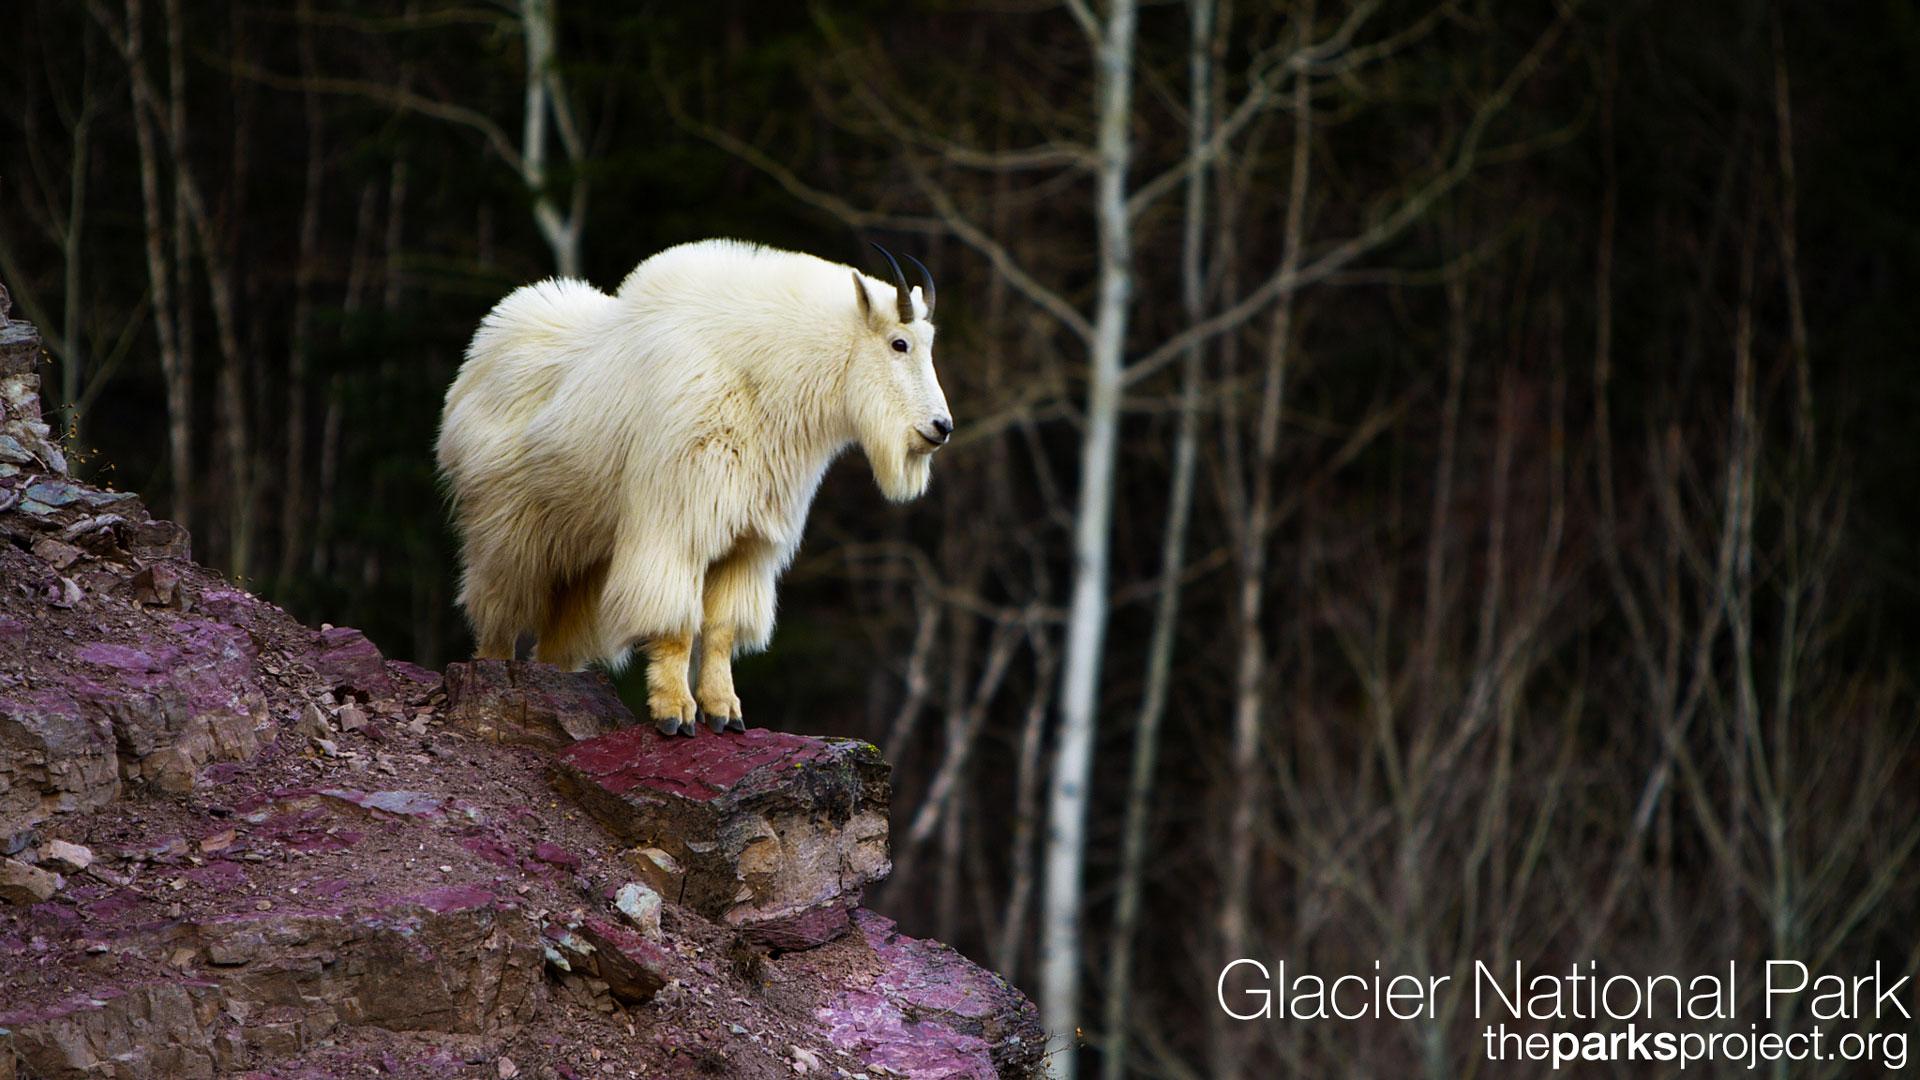 glacier park goat wallpaper 118309